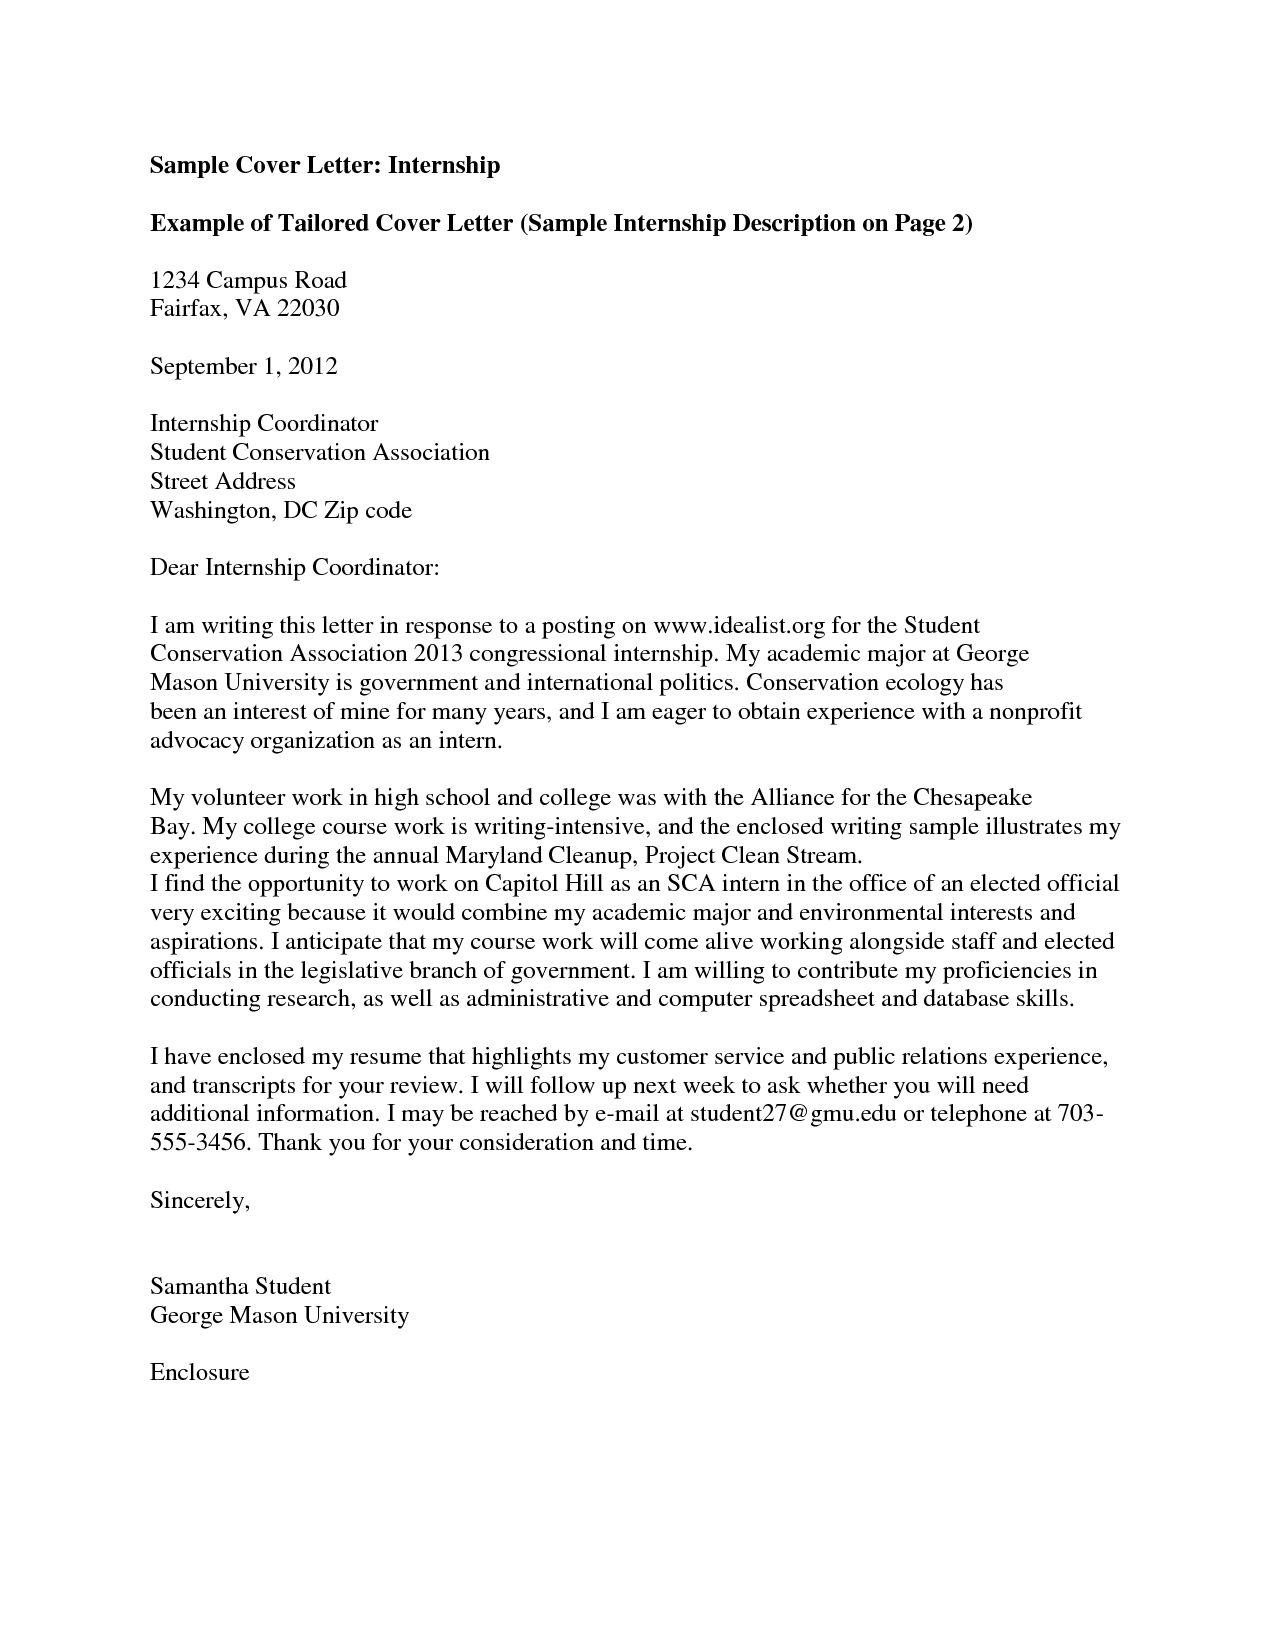 cover letter congressional internship - Suzen rabionetassociats com